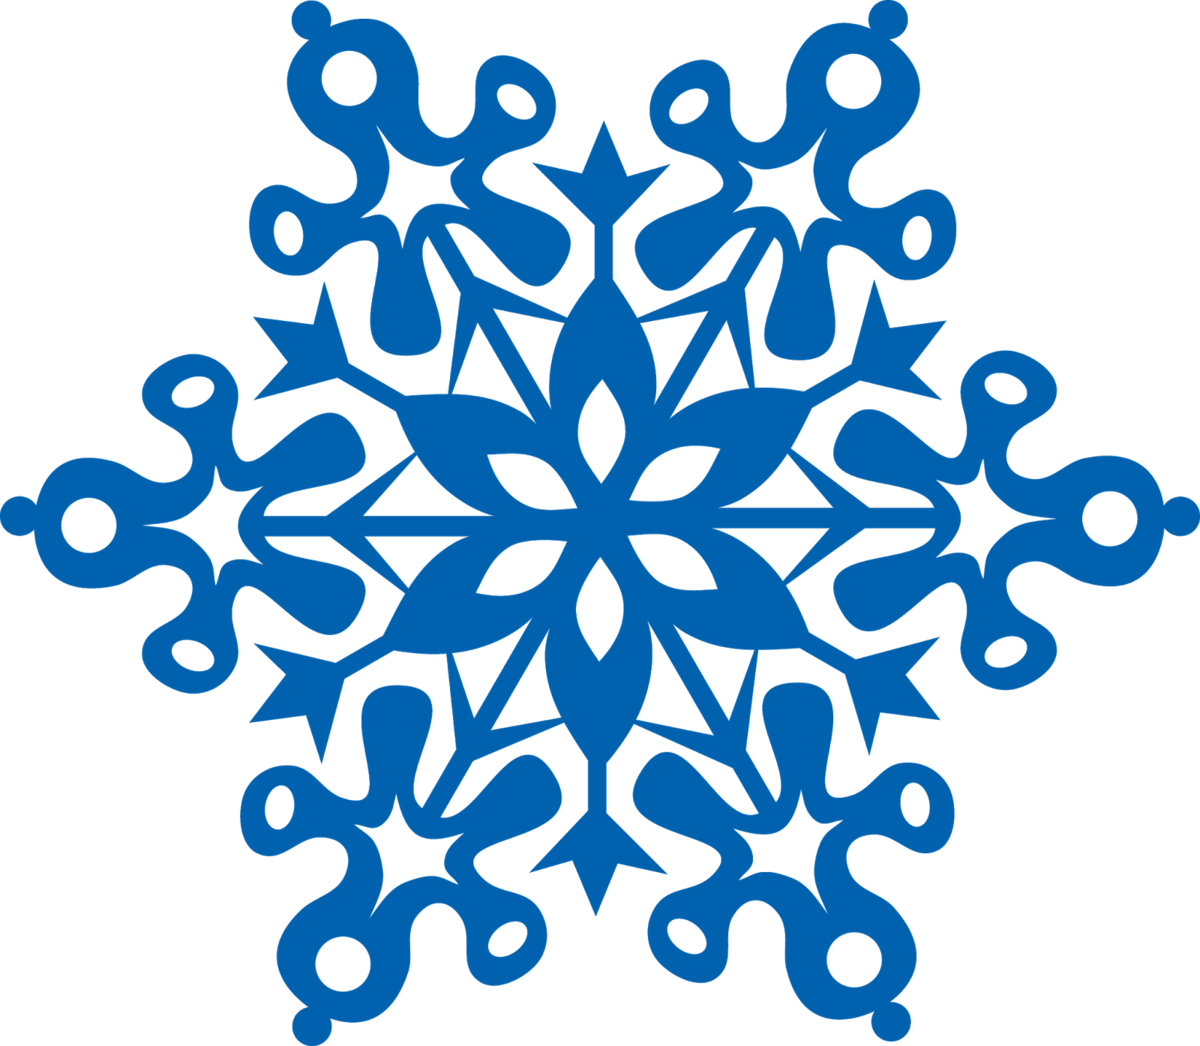 Картинки для детей на прозрачном фоне снежинки